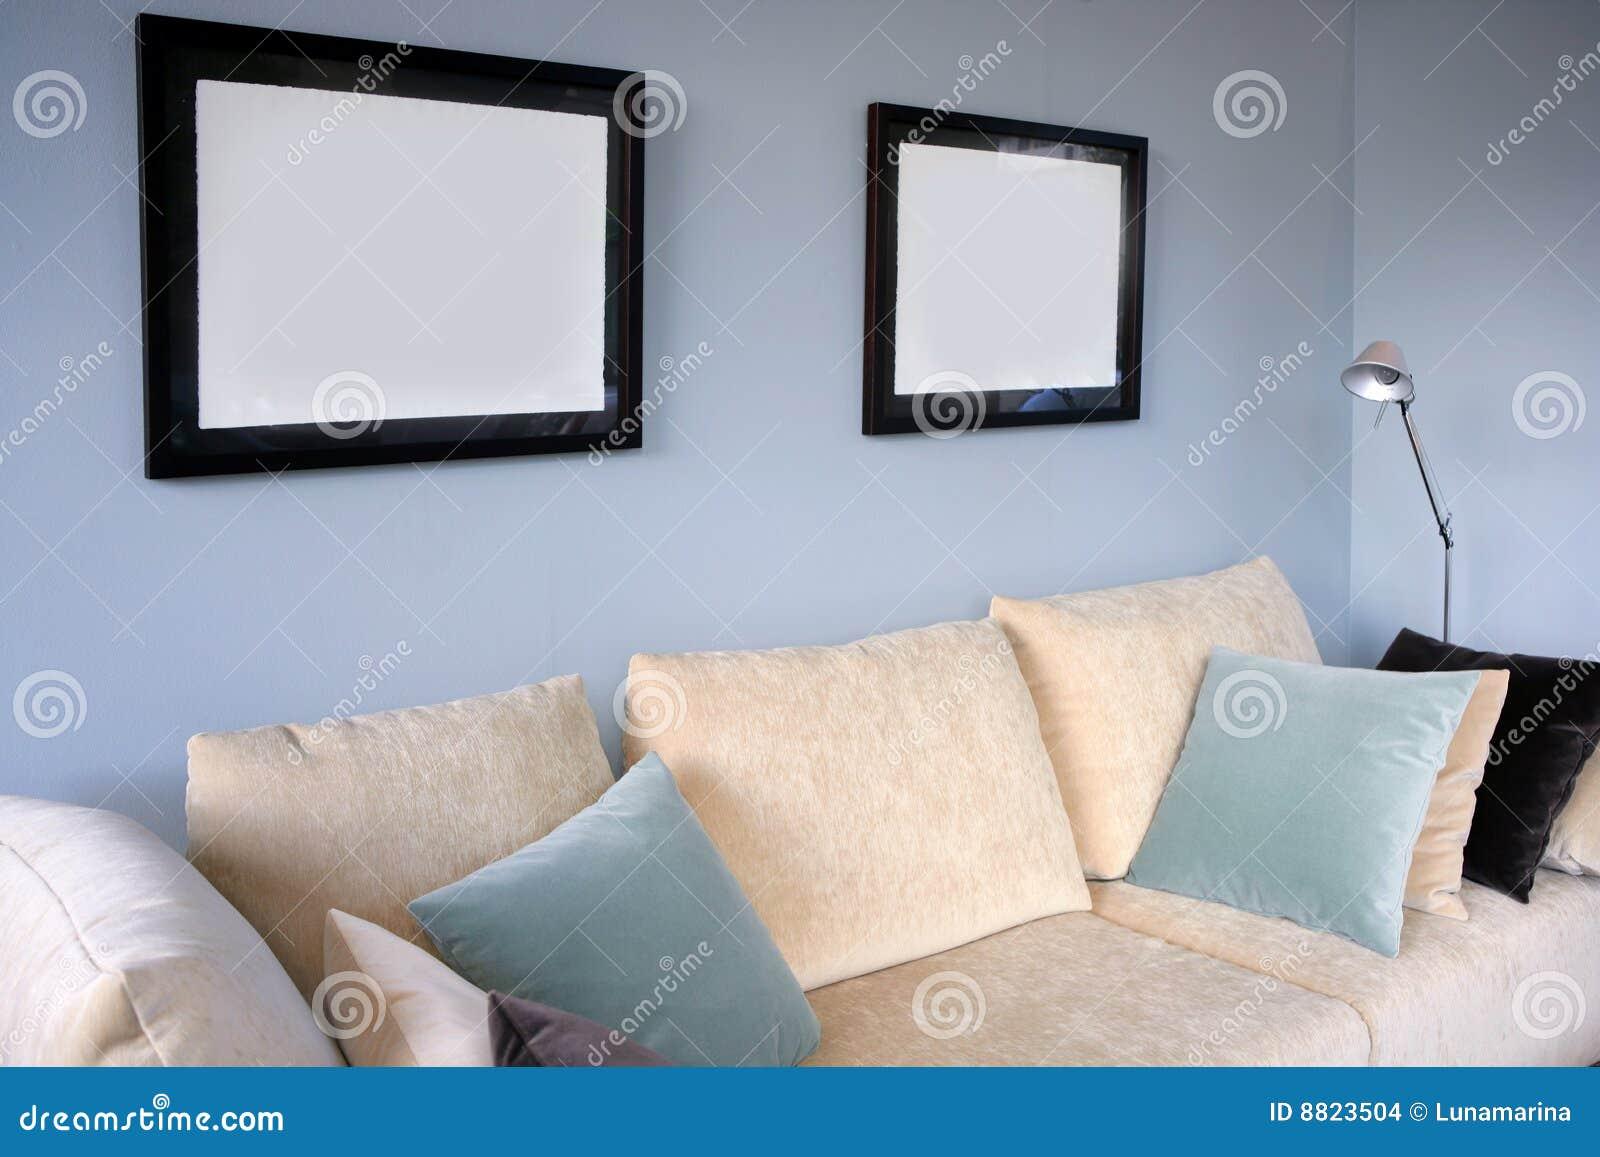 Muur ontwerp woonkamer blauwe bank ~ anortiz.com for .